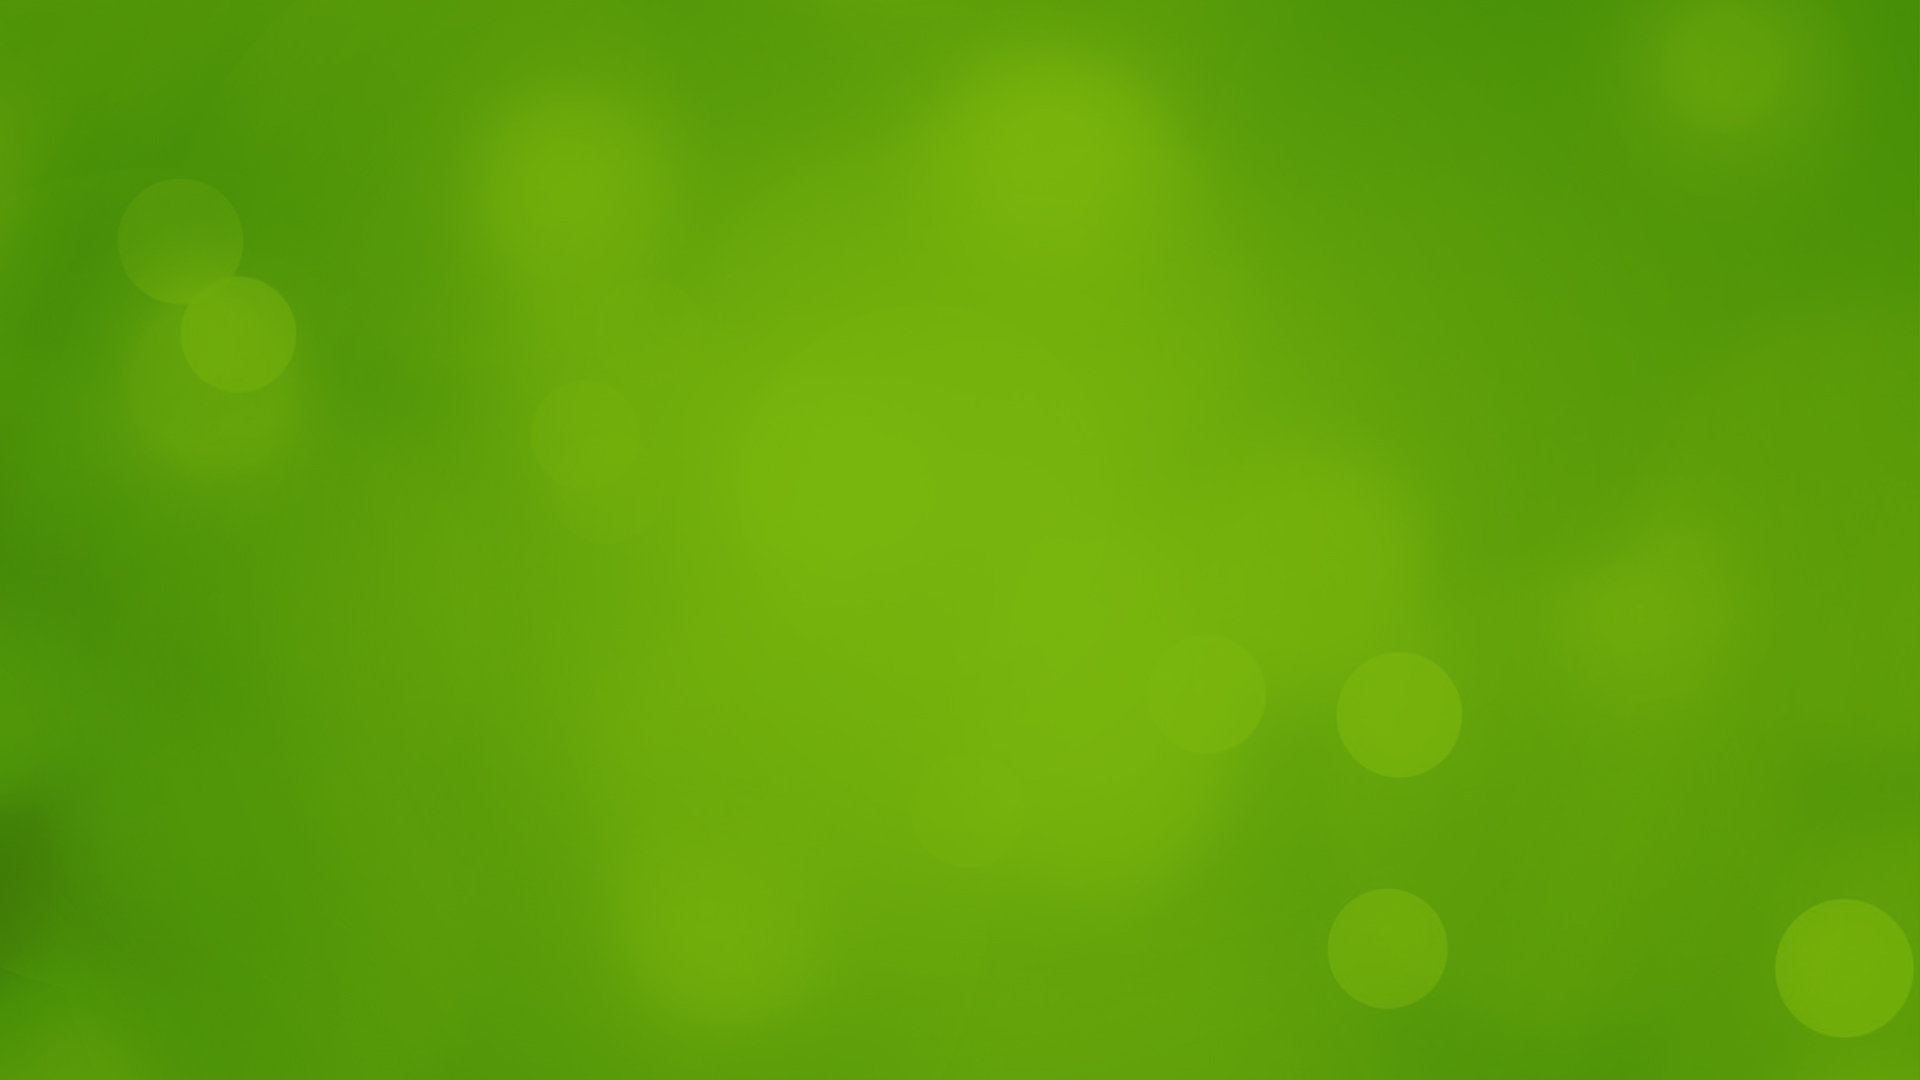 Background-Slider1-4